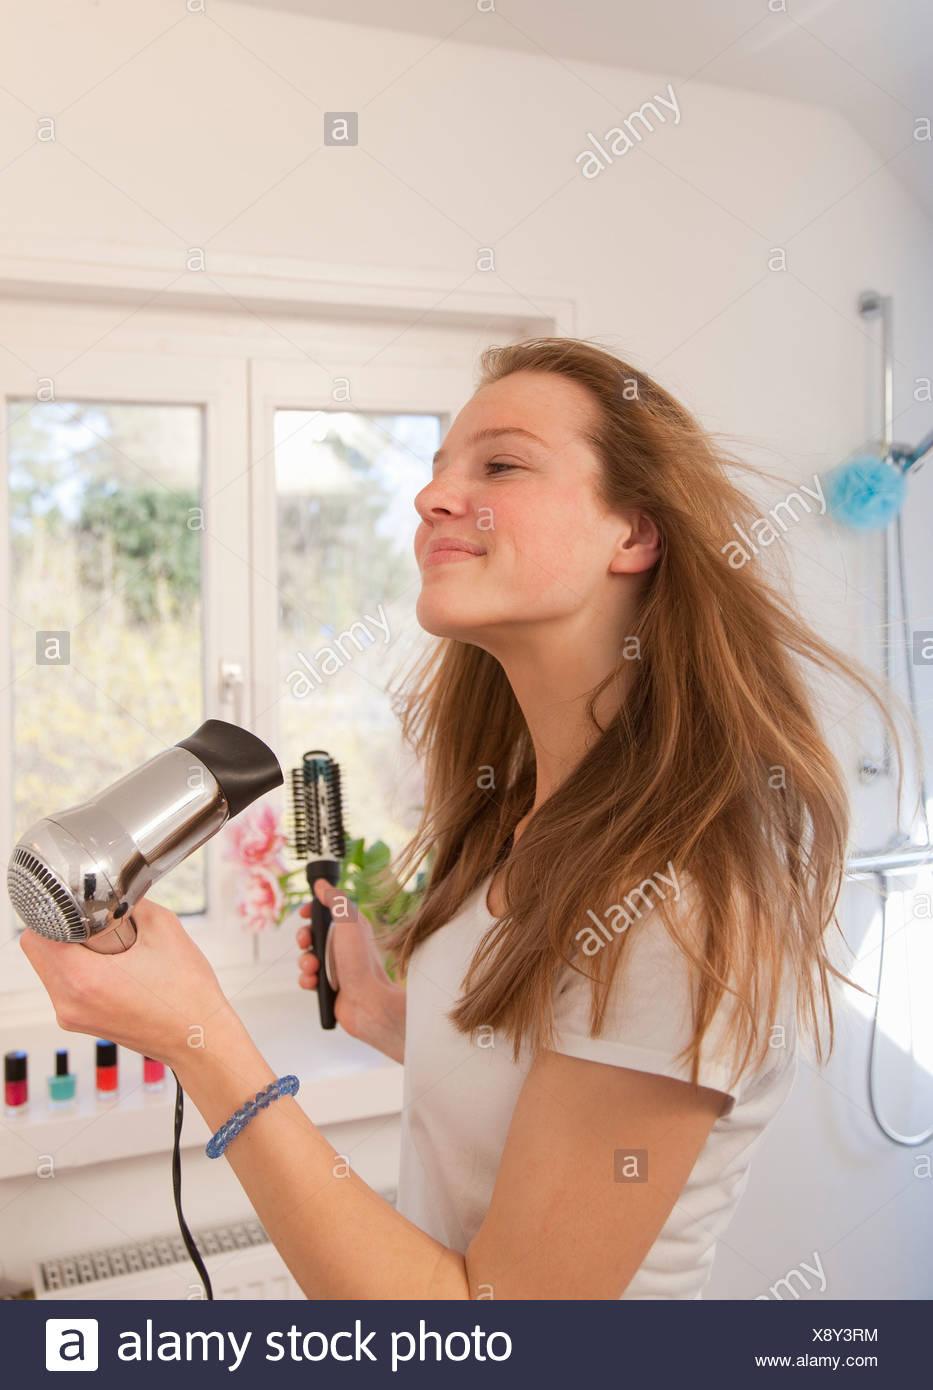 Teenage girl blow drying her hair - Stock Image